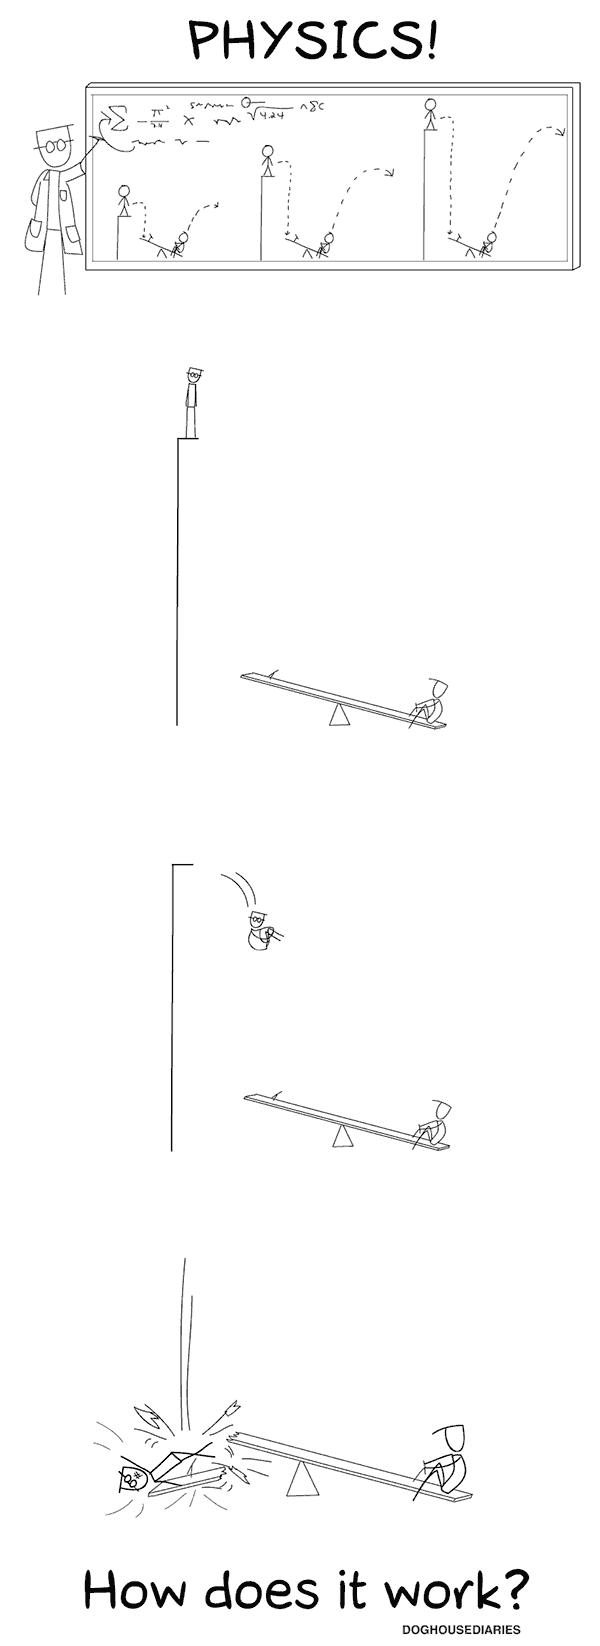 doghouse-physics